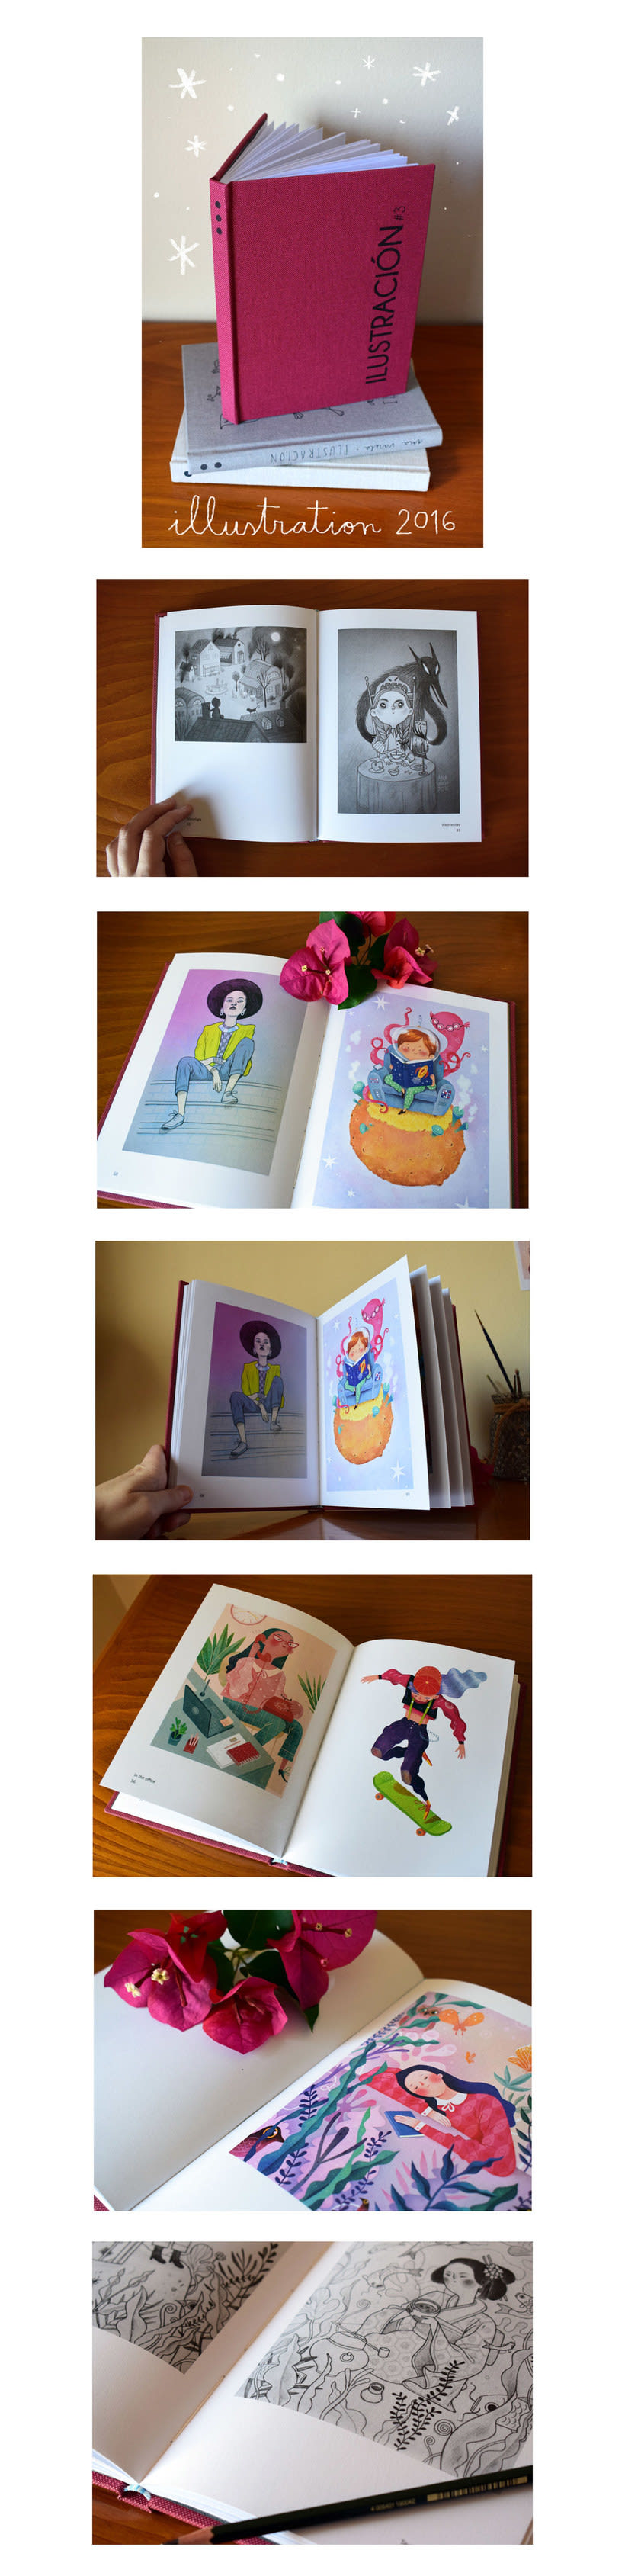 Compilation Books -1